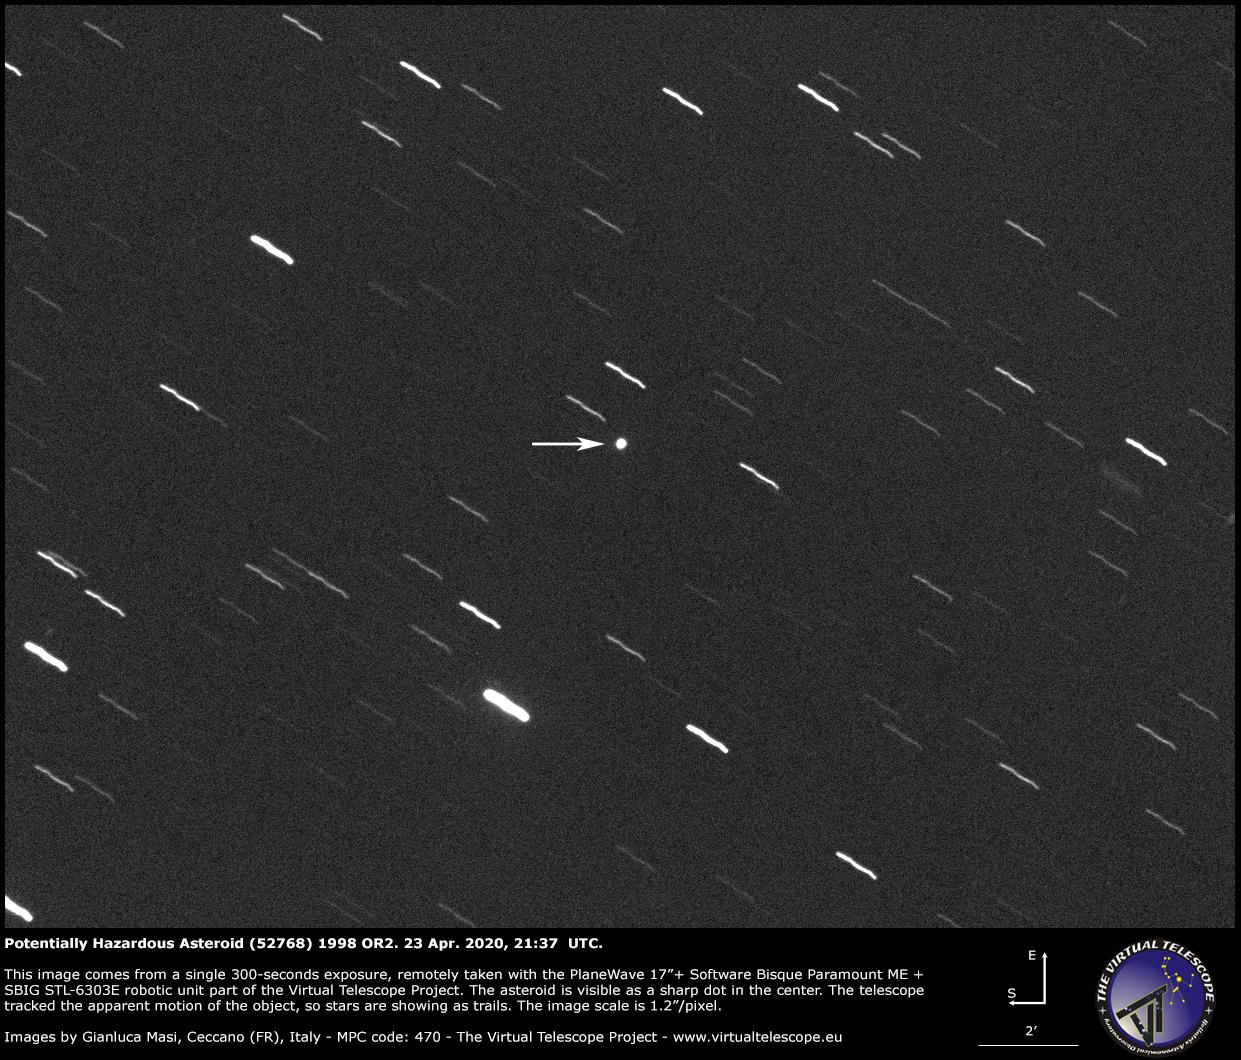 Potentially Hazardous Asteroid (52768) 1998 OR2: a image - 23 Apr. 2020